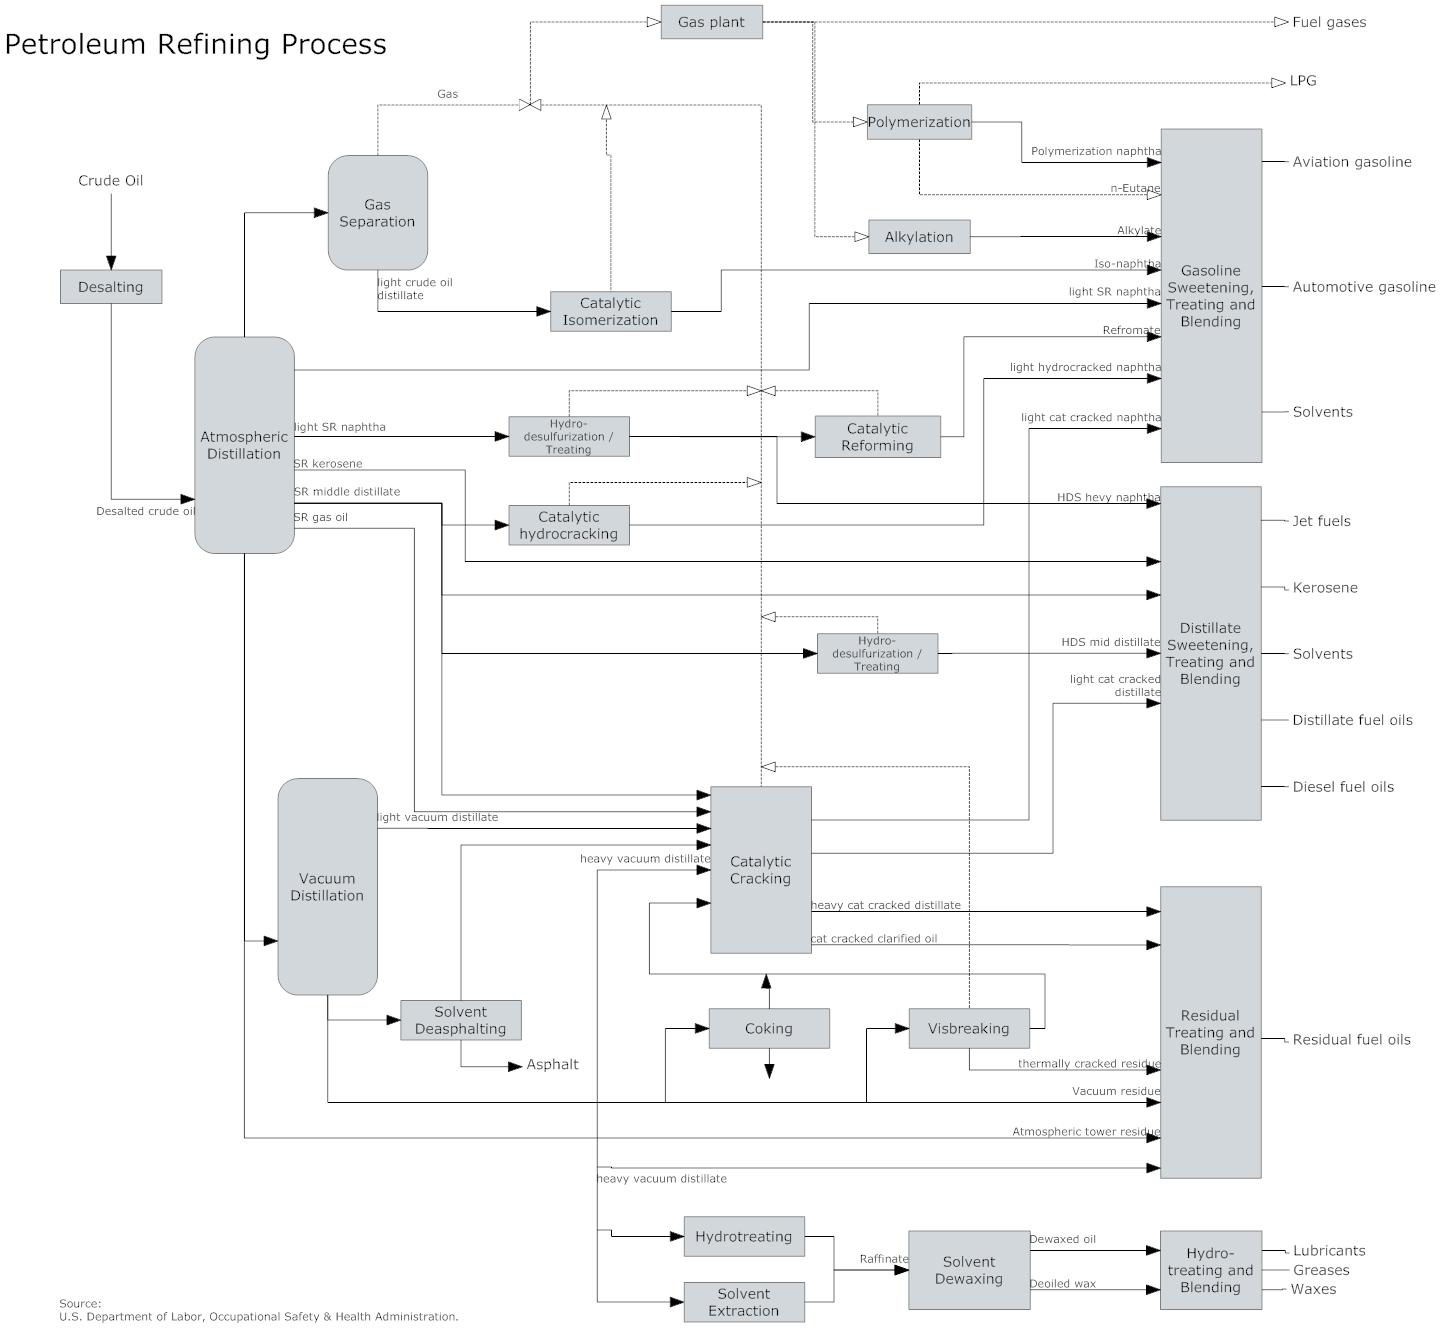 process flow diagram creator free - wiring diagram schemes  wiring diagram schemes - mein-raetien